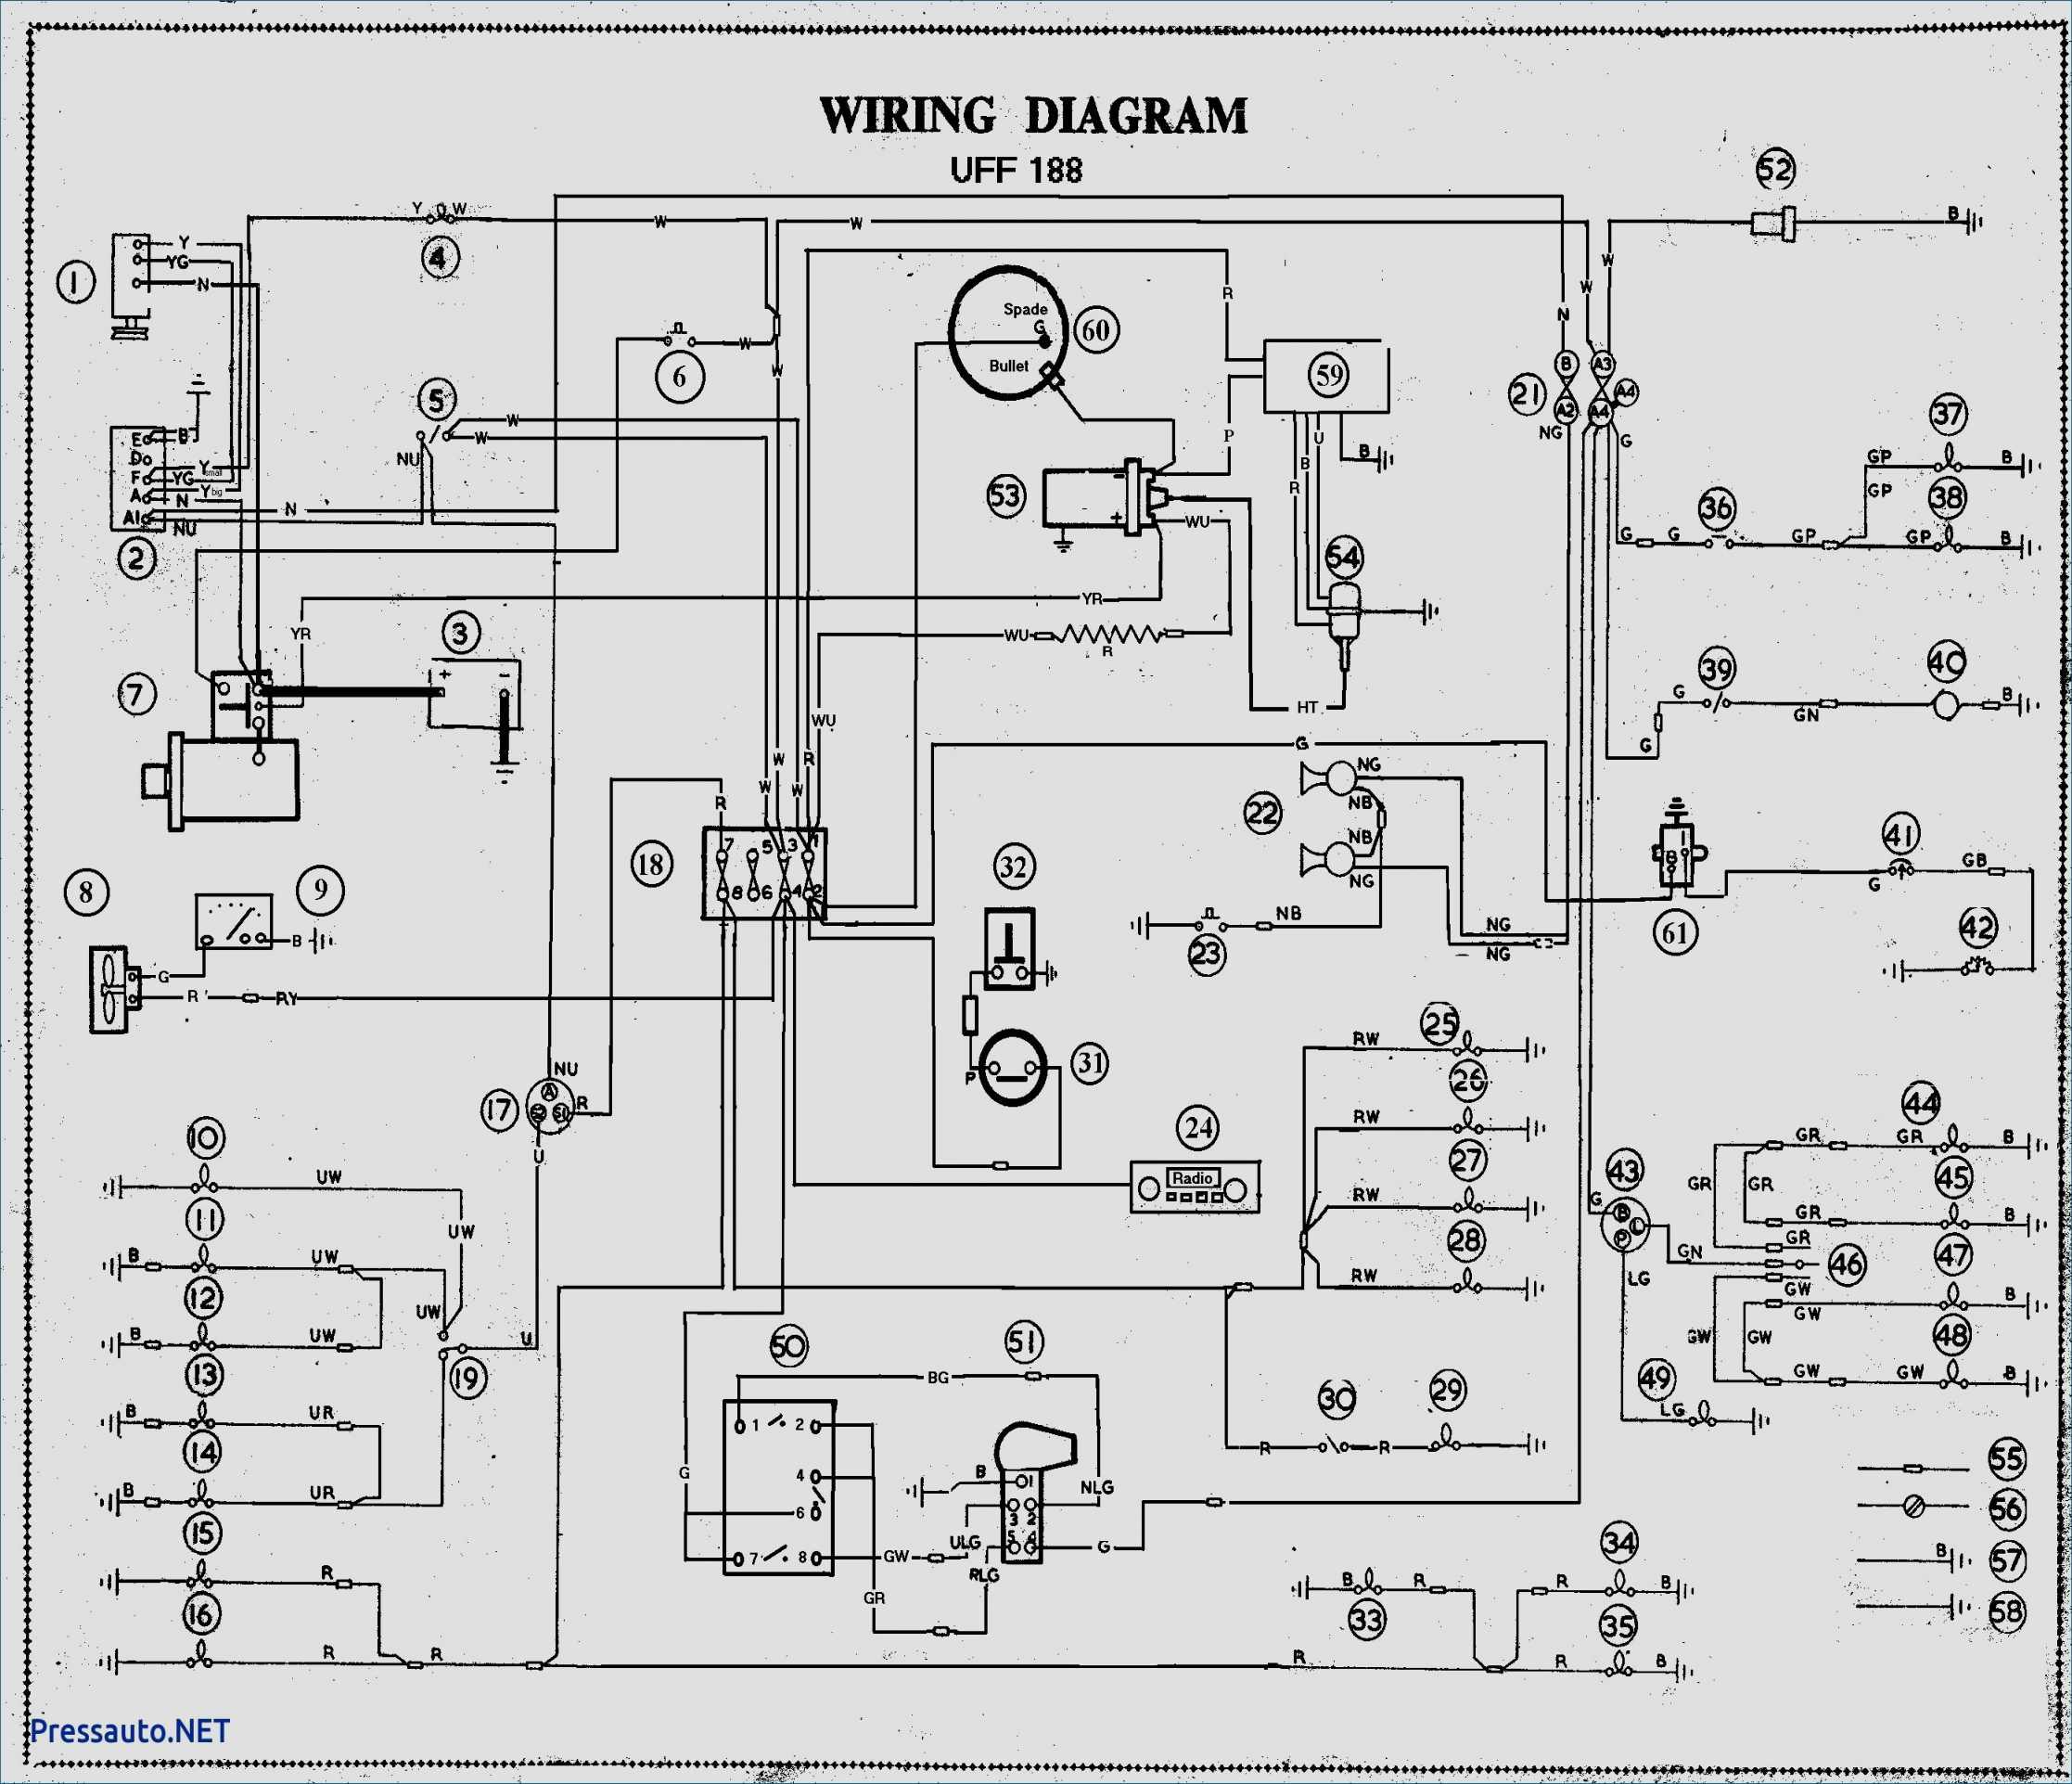 Bulldog Remote Car Starter Wiring Diagram